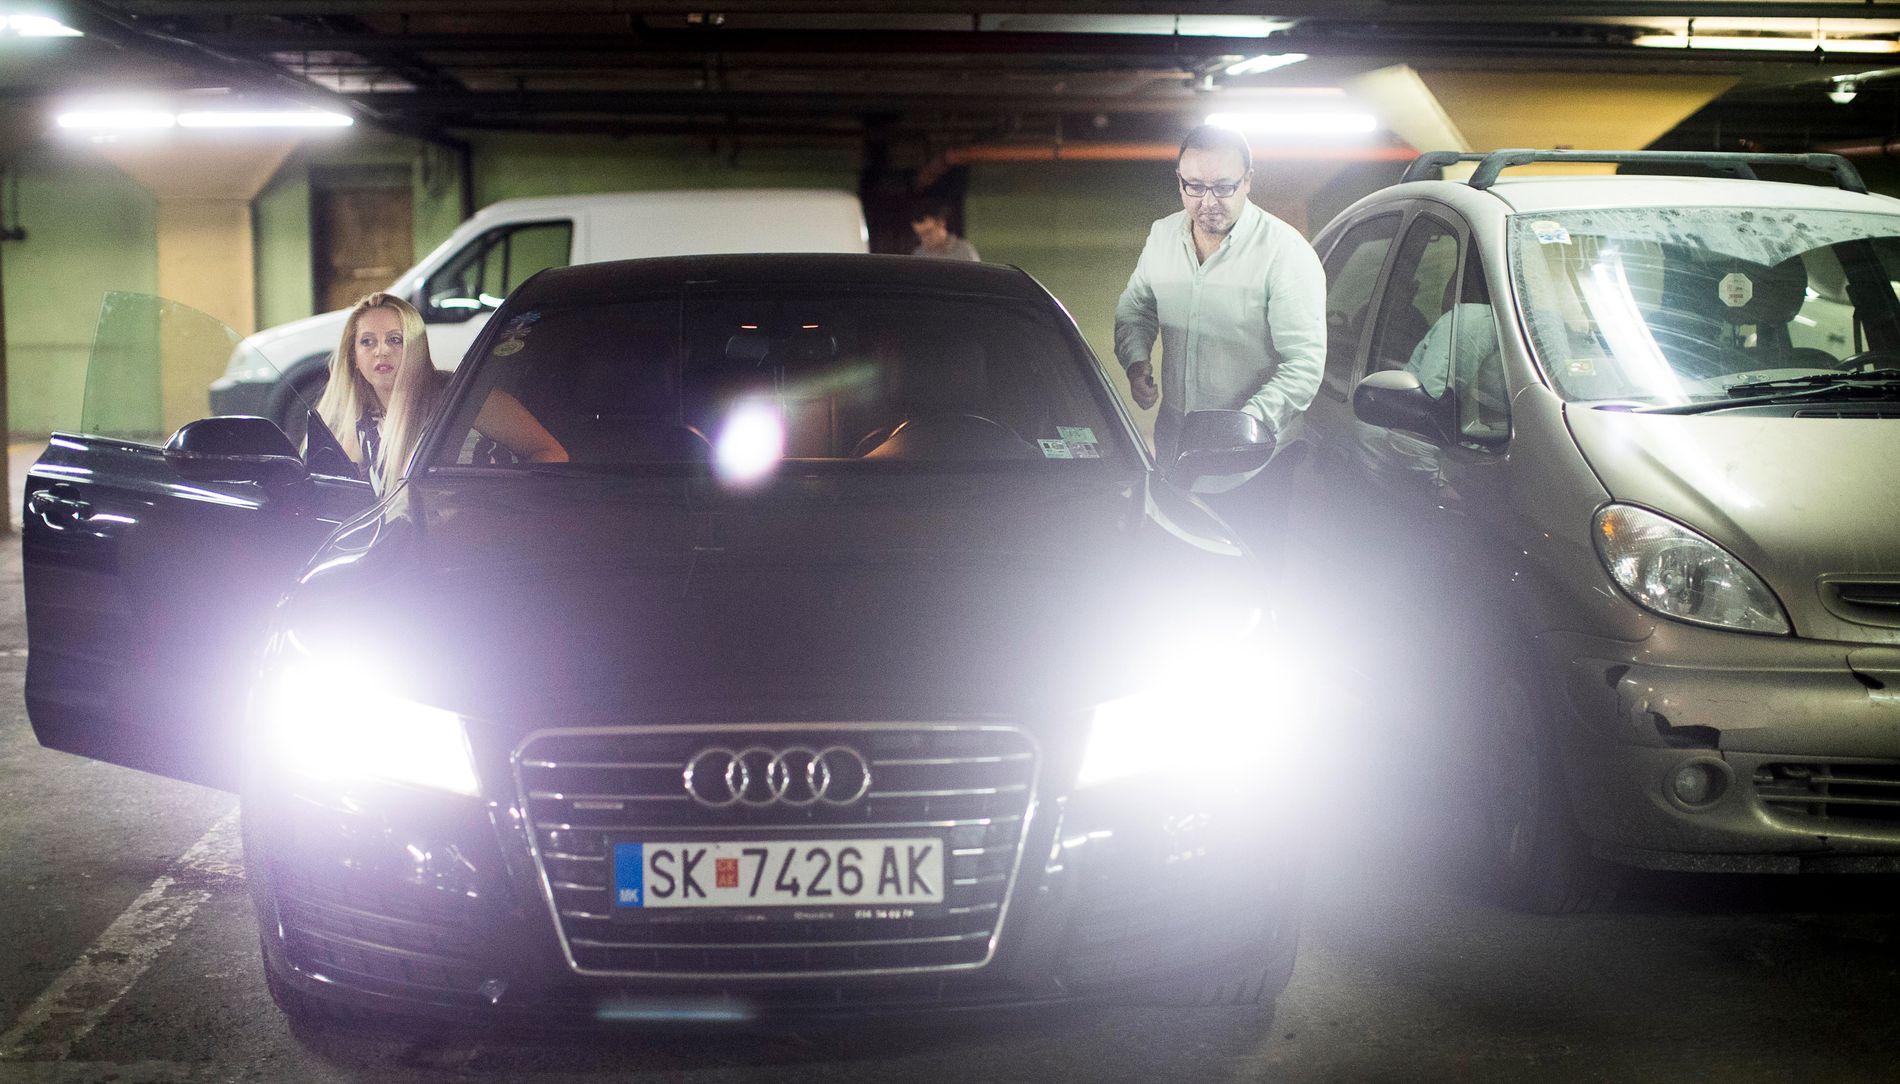 BAKMANNEN: Mirko Ceselkoski (38) og kona Jovanka (37) har tjent gode penger på «fake news». Ceselkoski kjører en Audi A7 og Jovanka en Mercedes-Benz S-klasse.